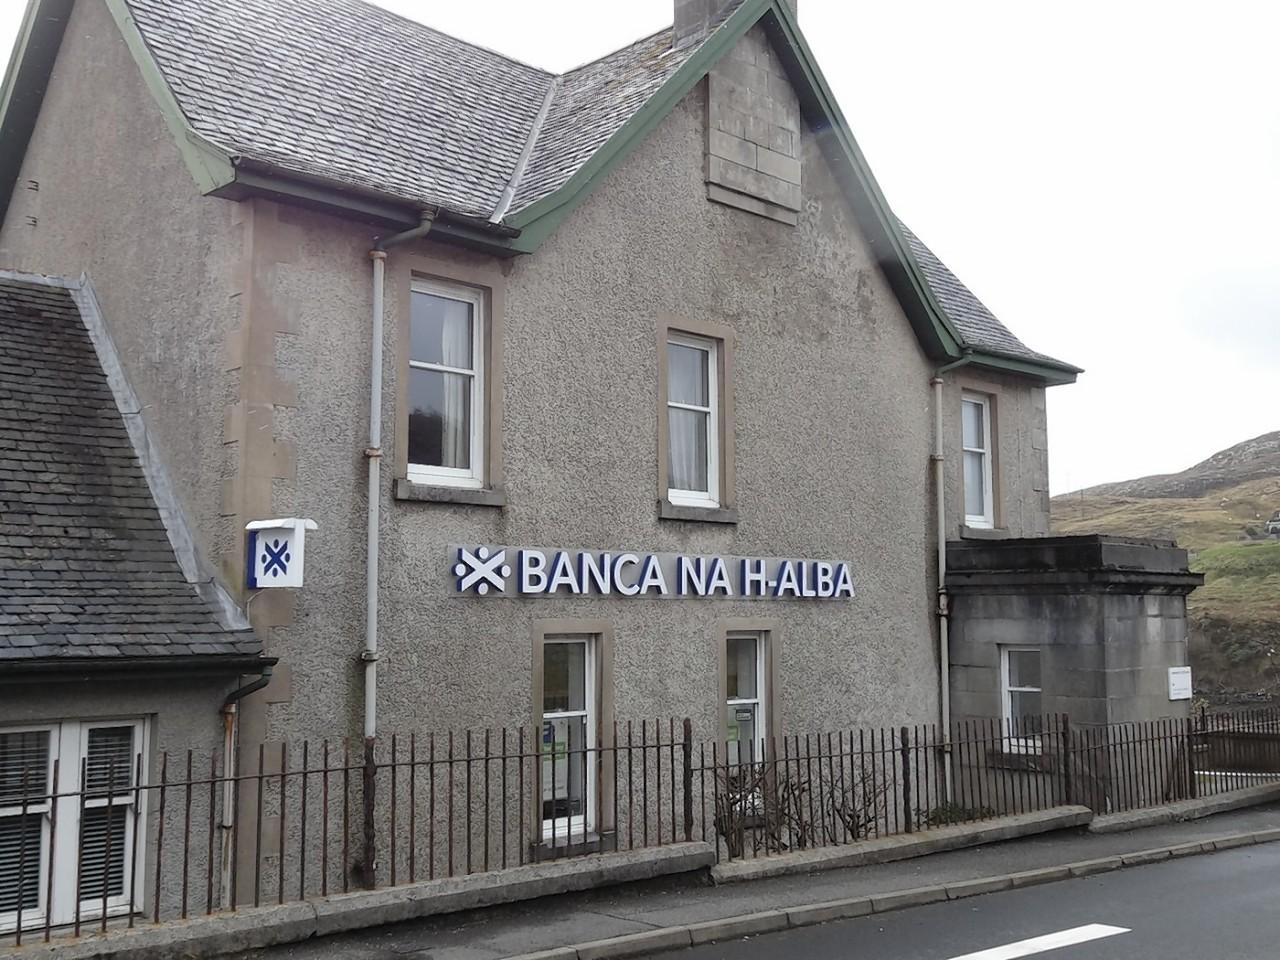 Bank of Scotland in Lochmaddy